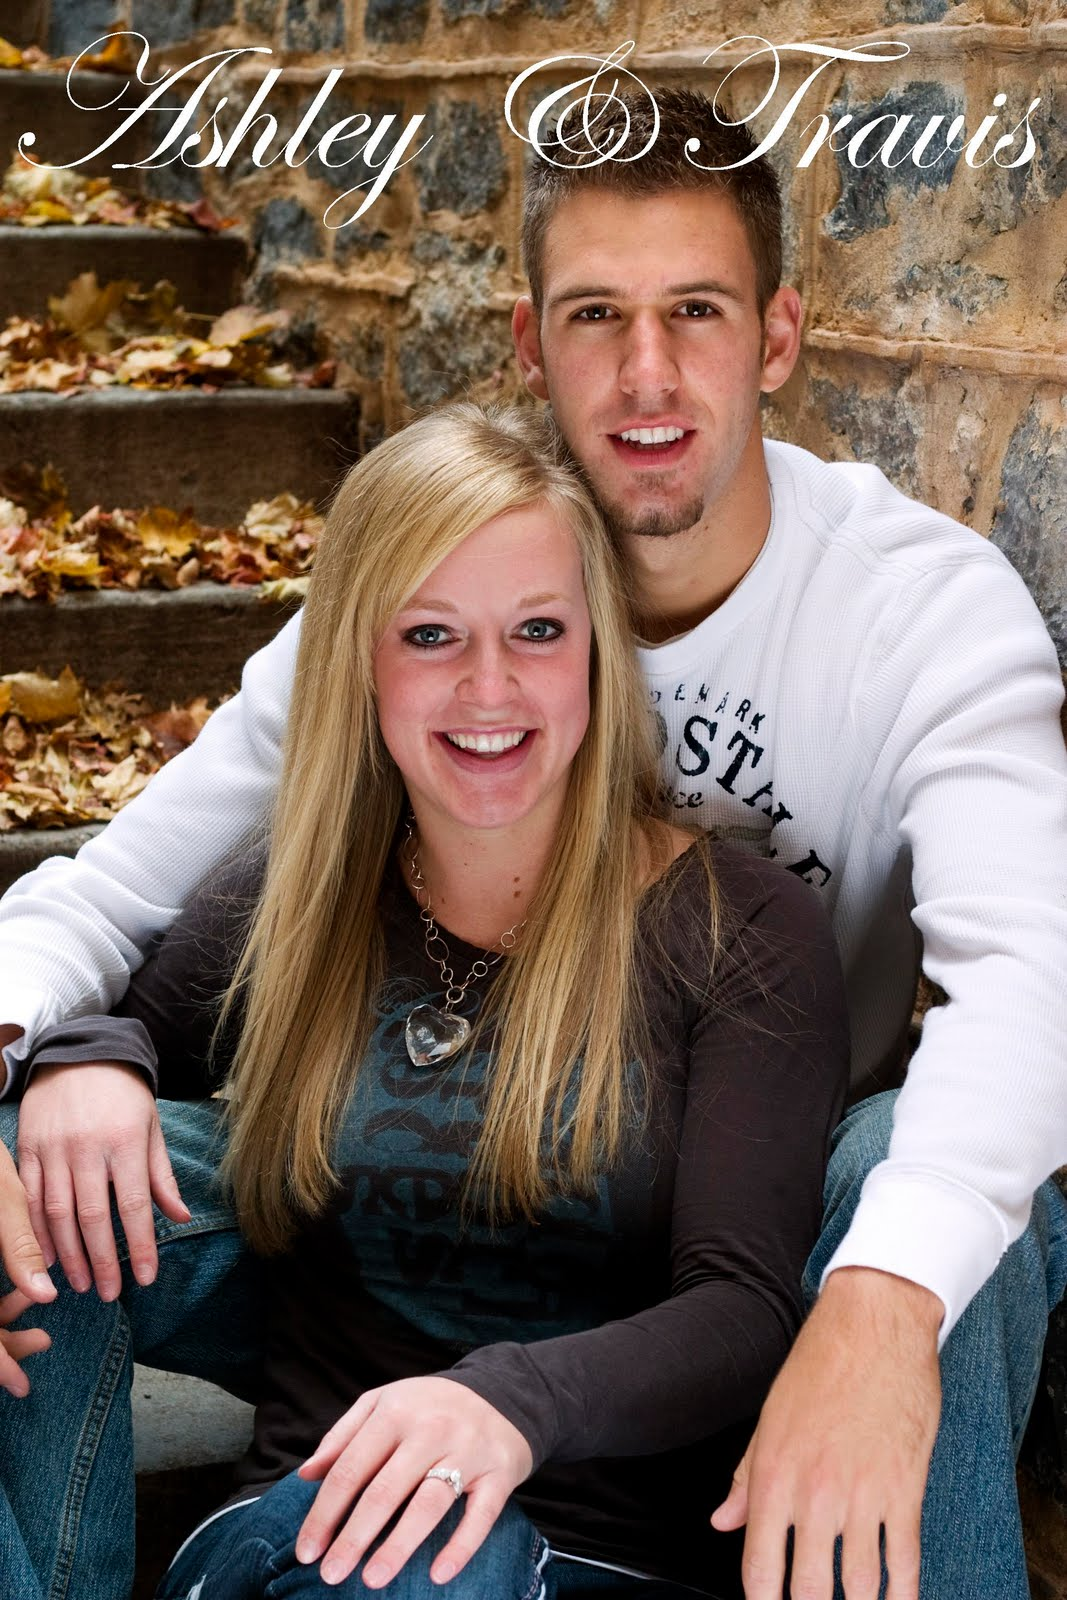 Ashley & Travis